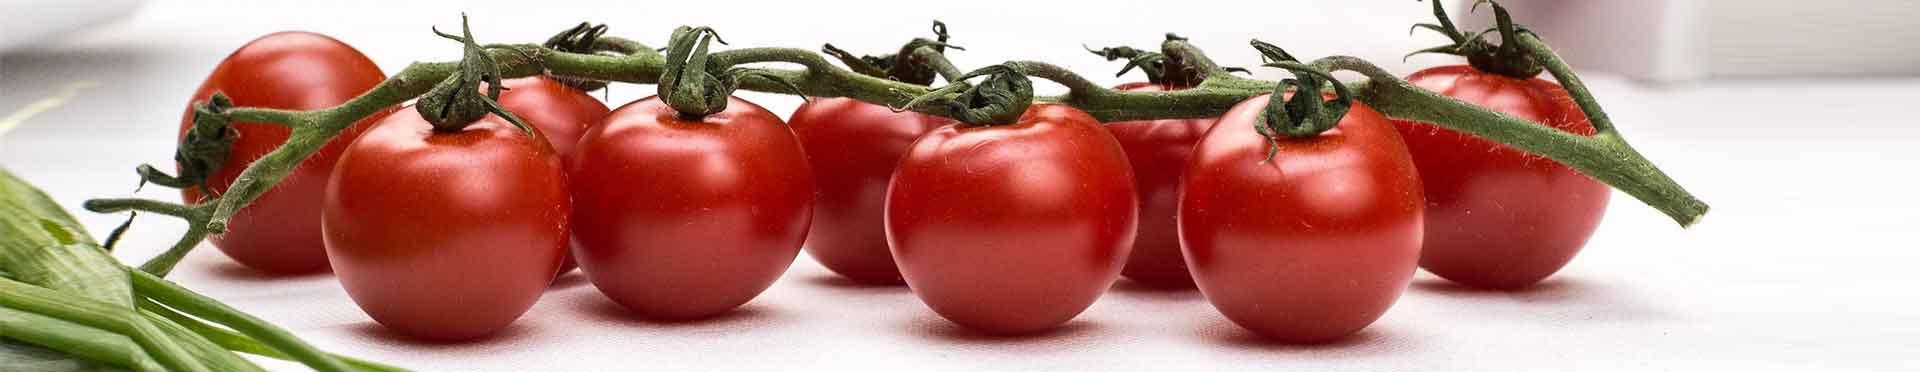 tomates obtenidos con fertilizantes certificados